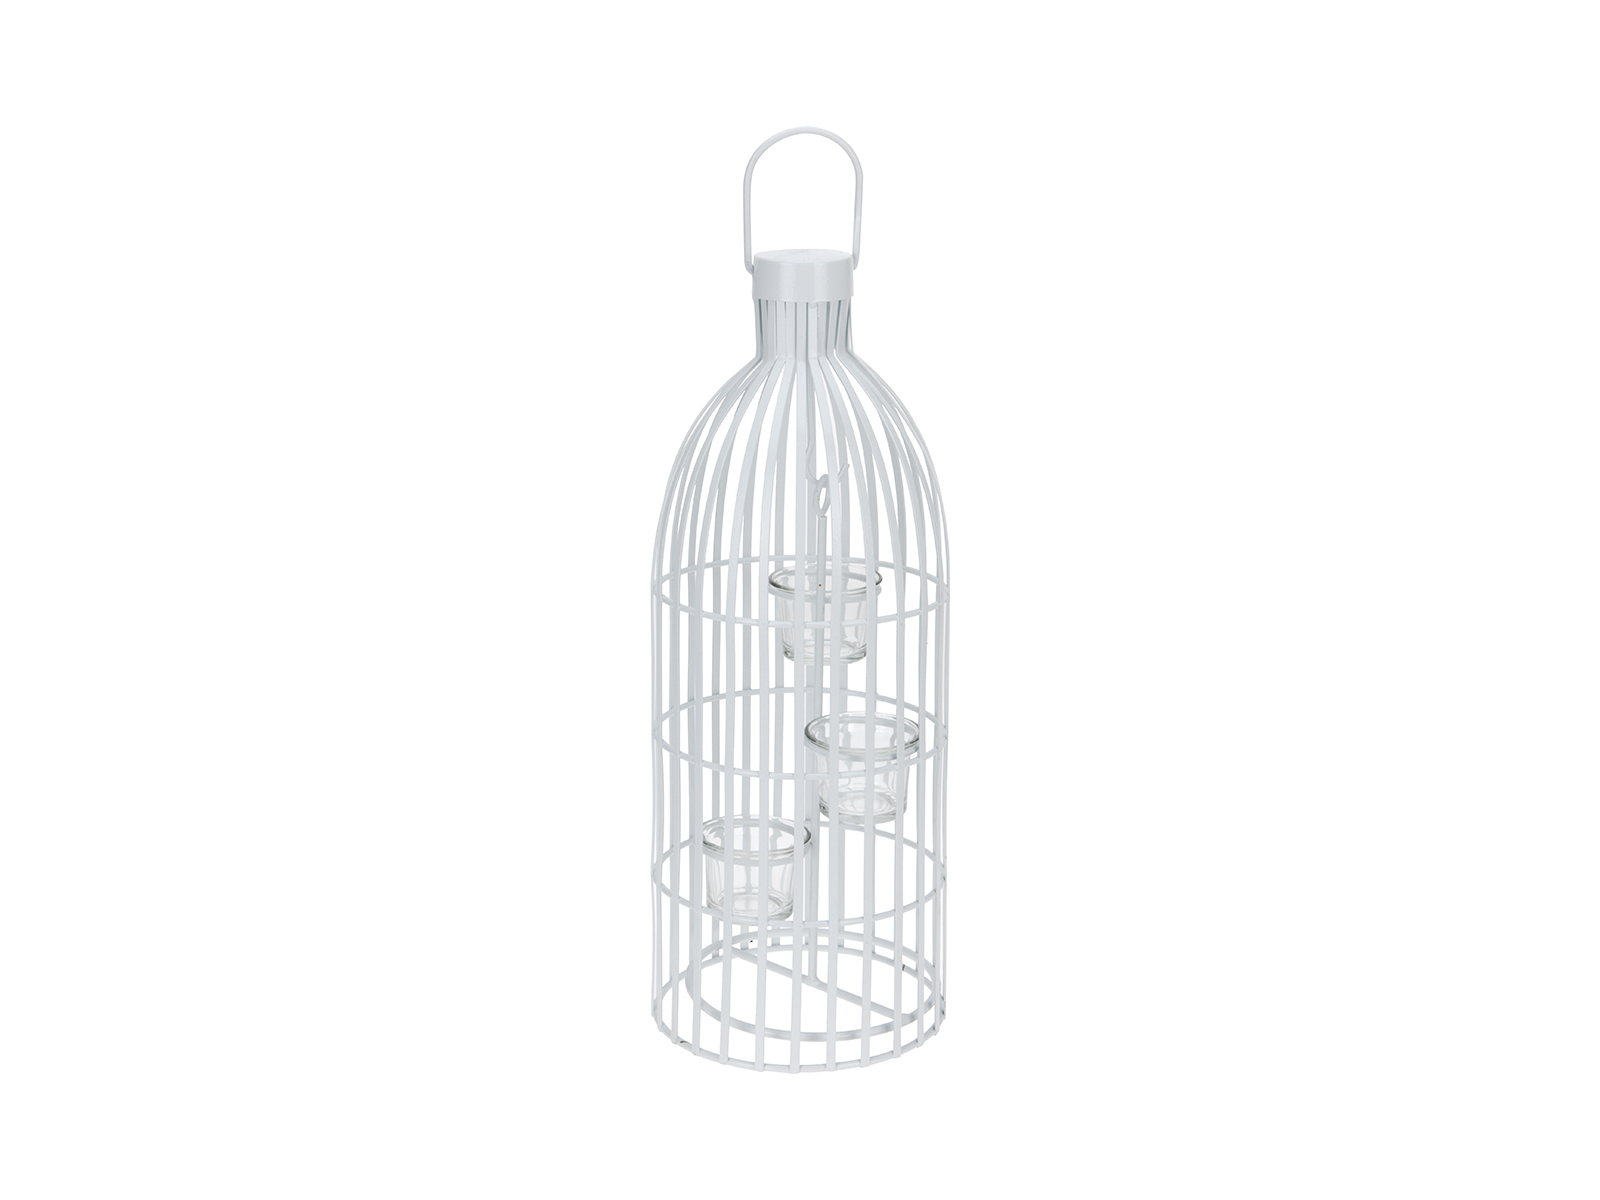 Подсвечник Birds cageСвечи и подсвечники<br><br>